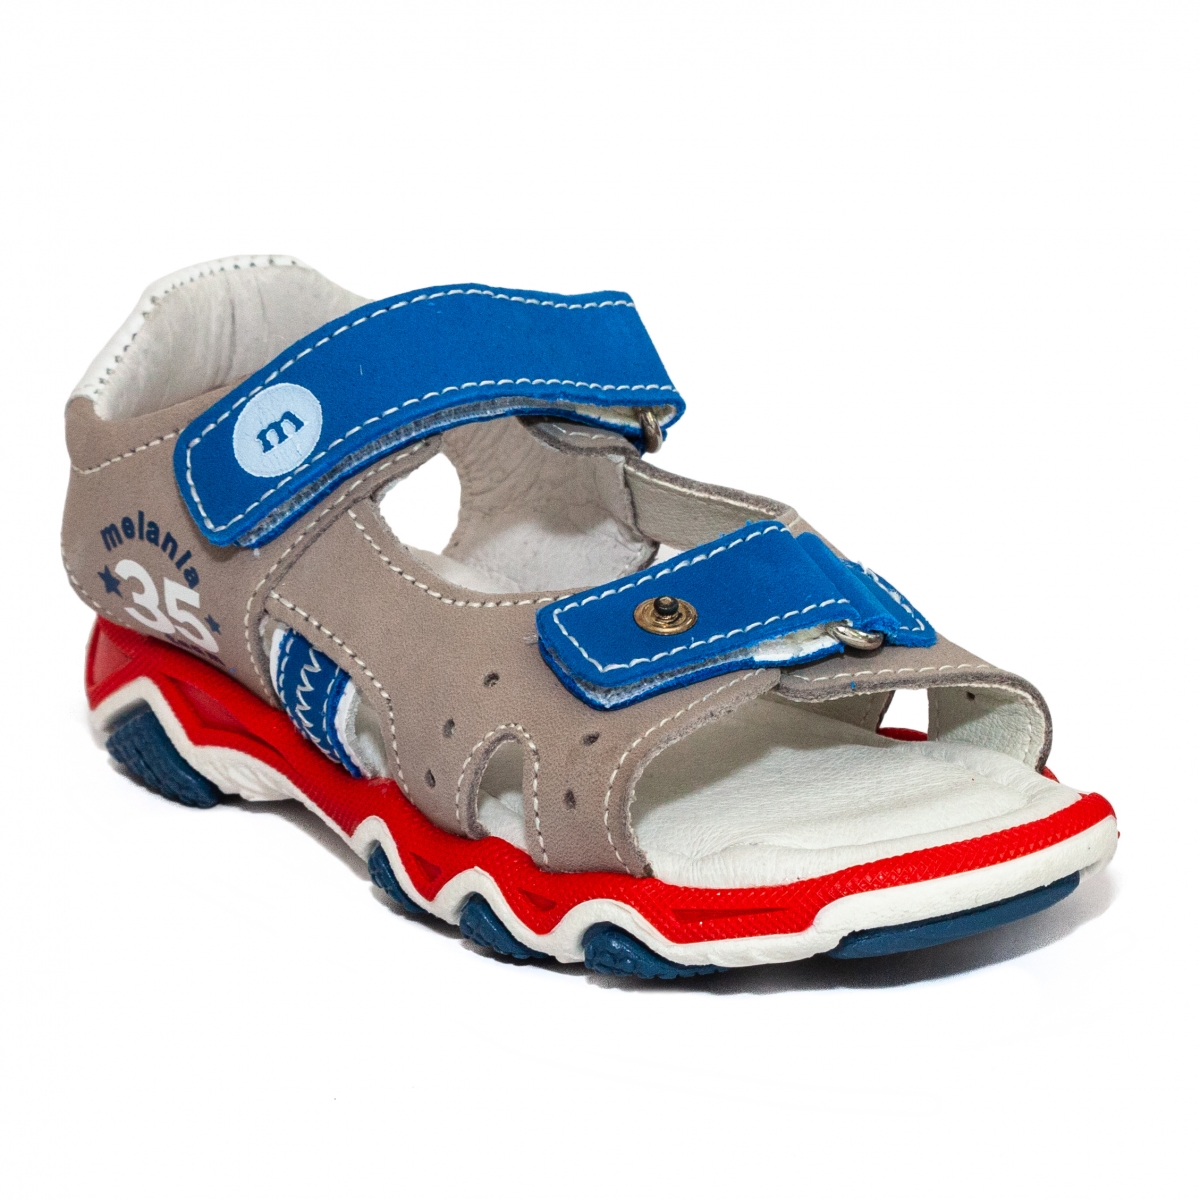 Sandale baieti Melania 4060 albastru gri 25-38